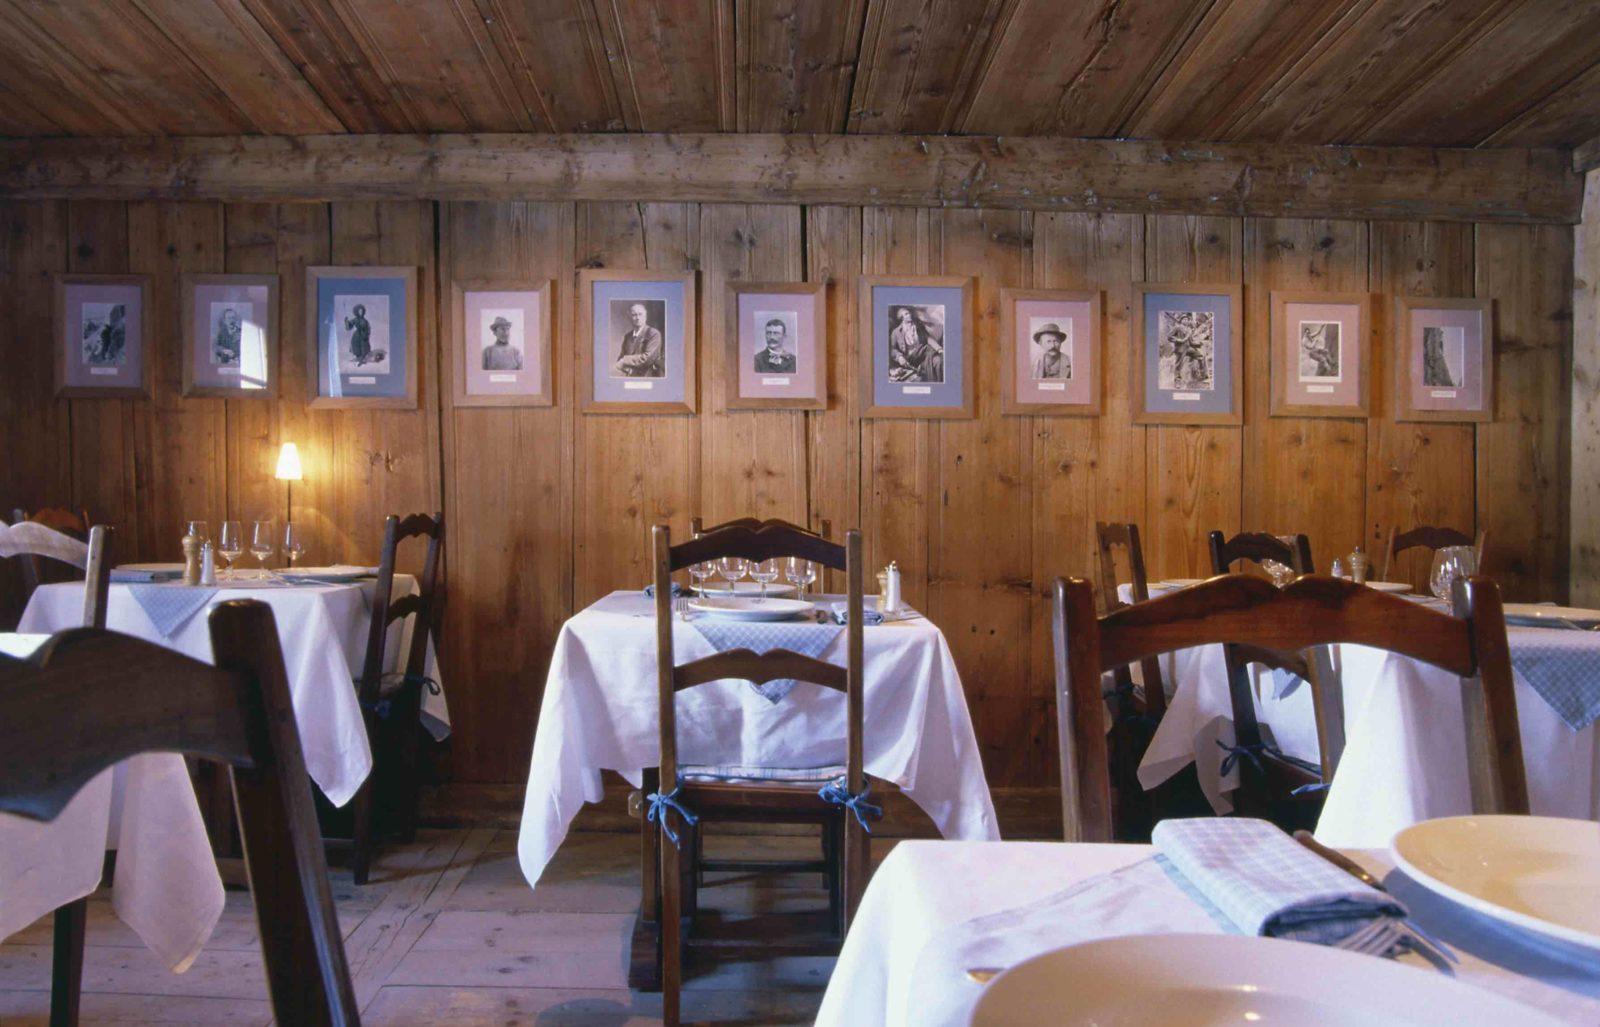 Chamonix Hôtel 5* Hameau Albert 1er restaurant maison carrier